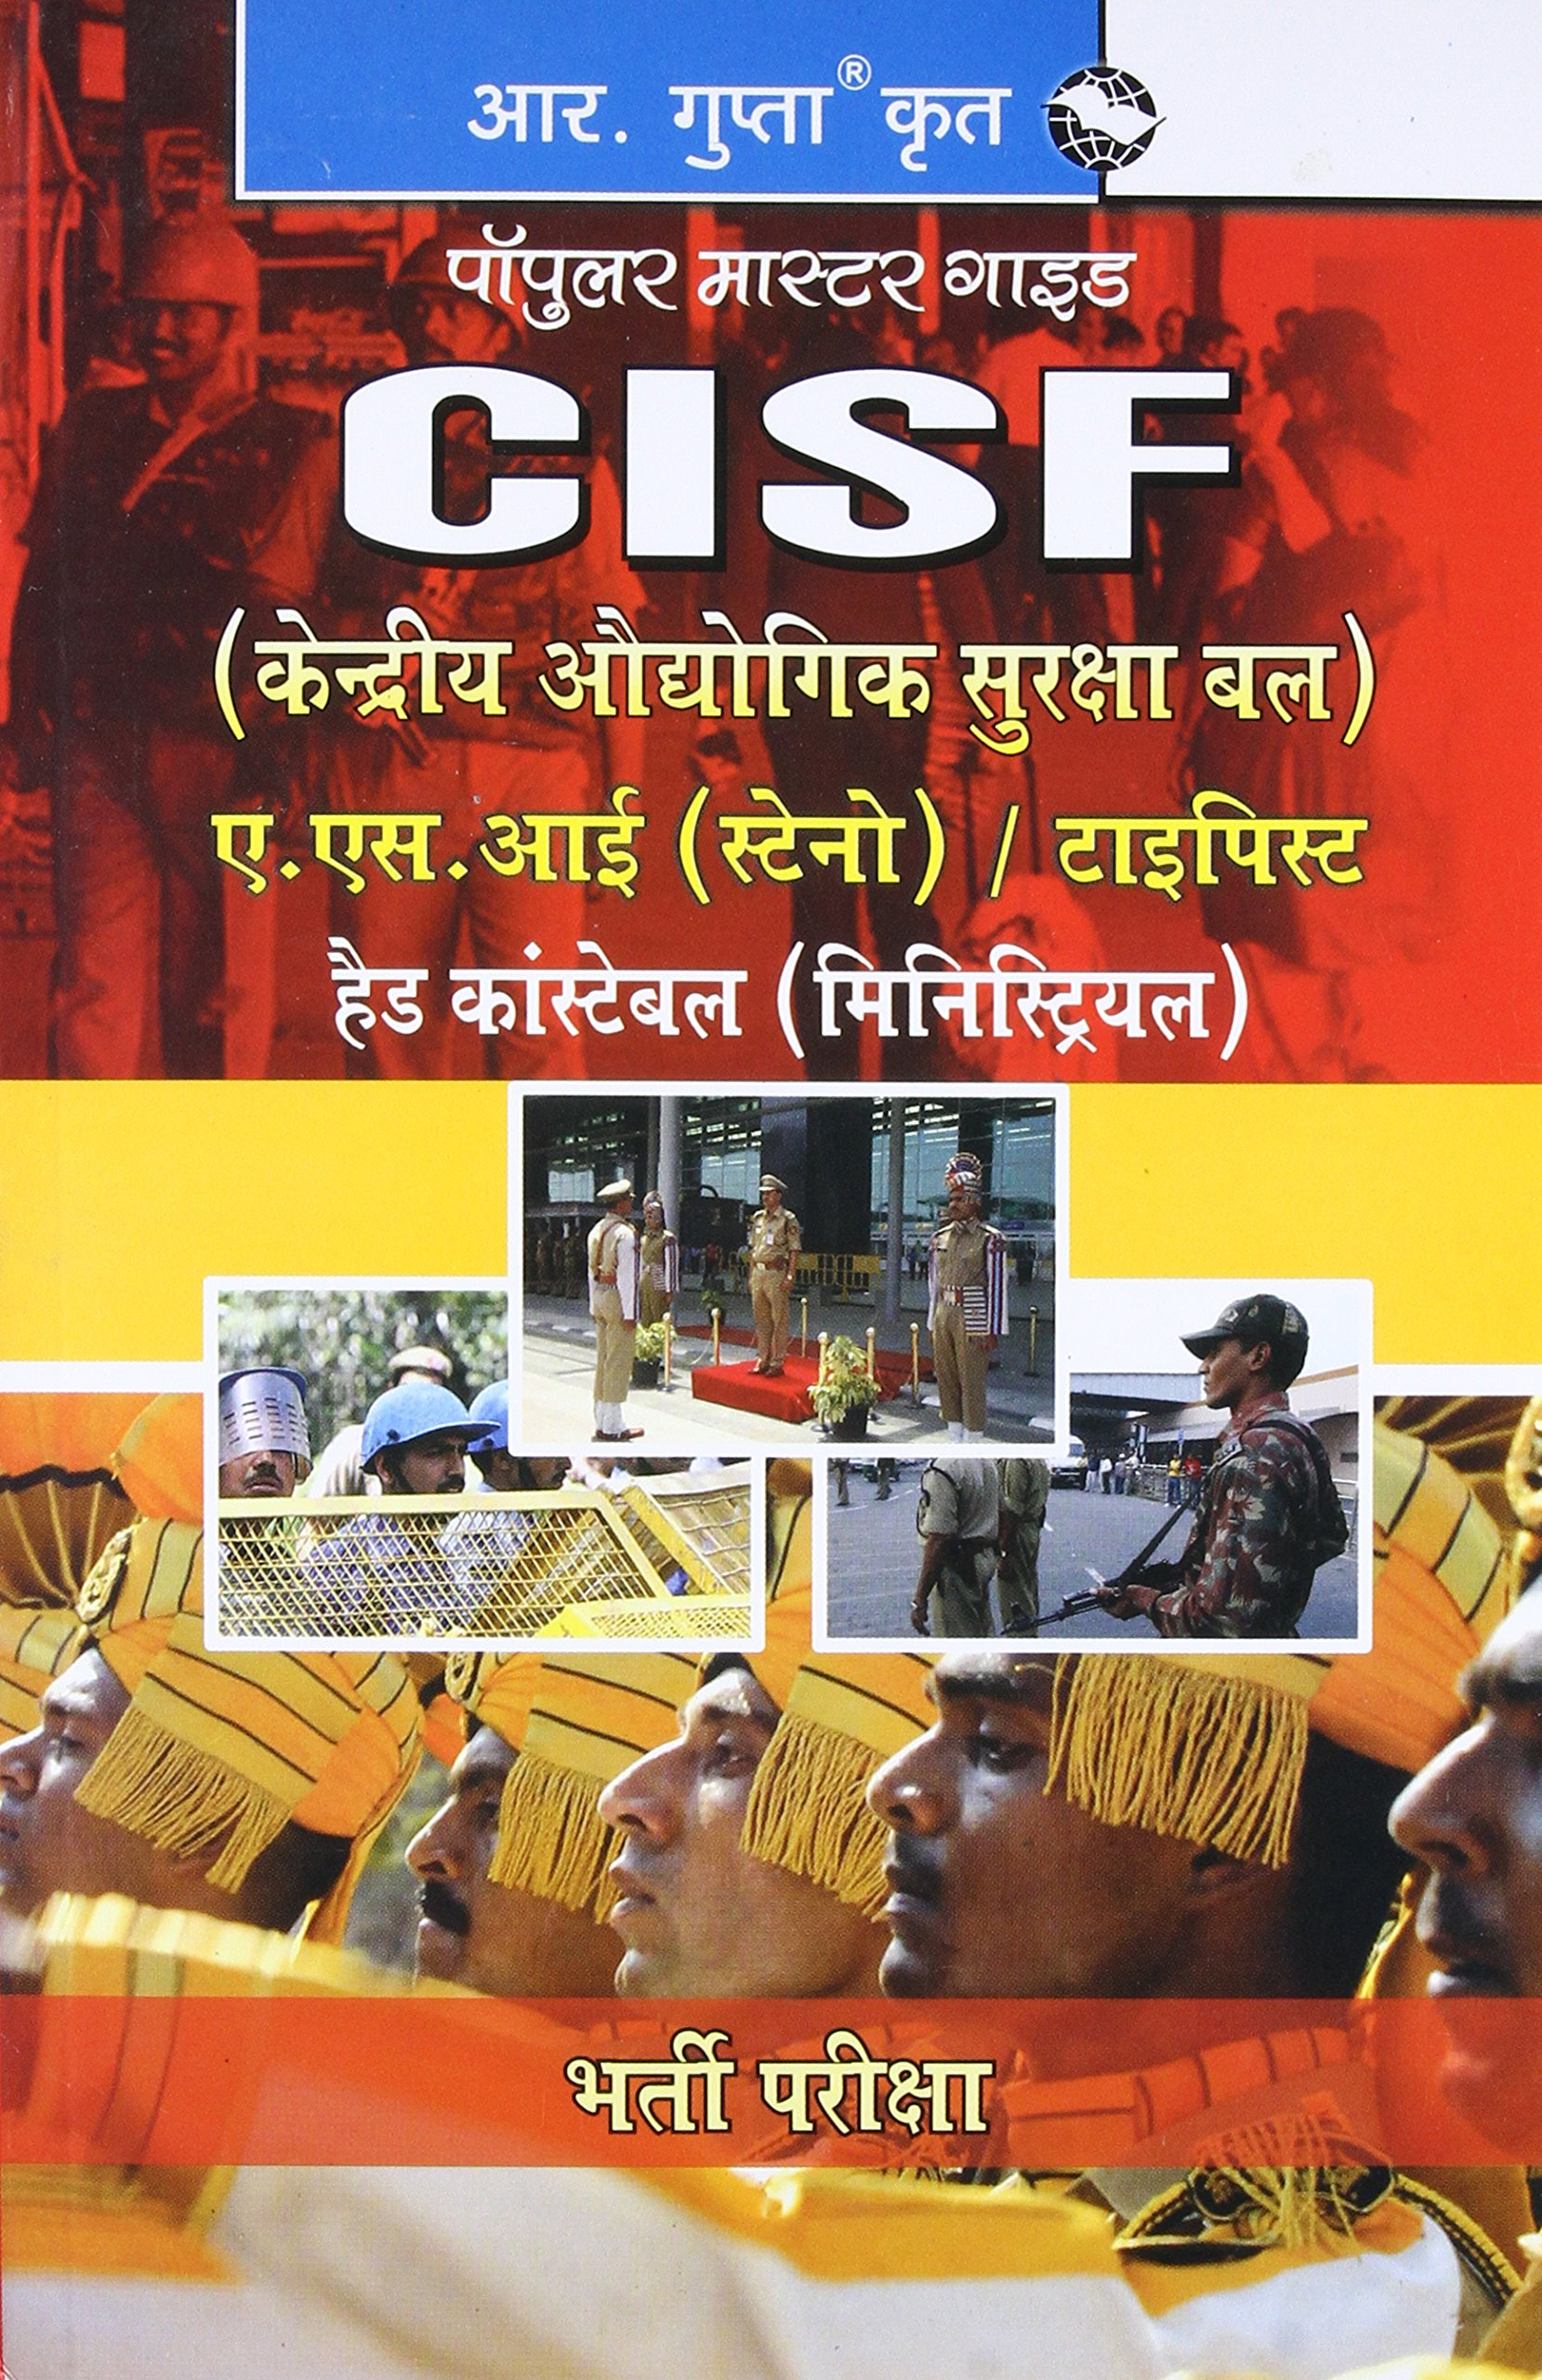 cisf wallpaper download